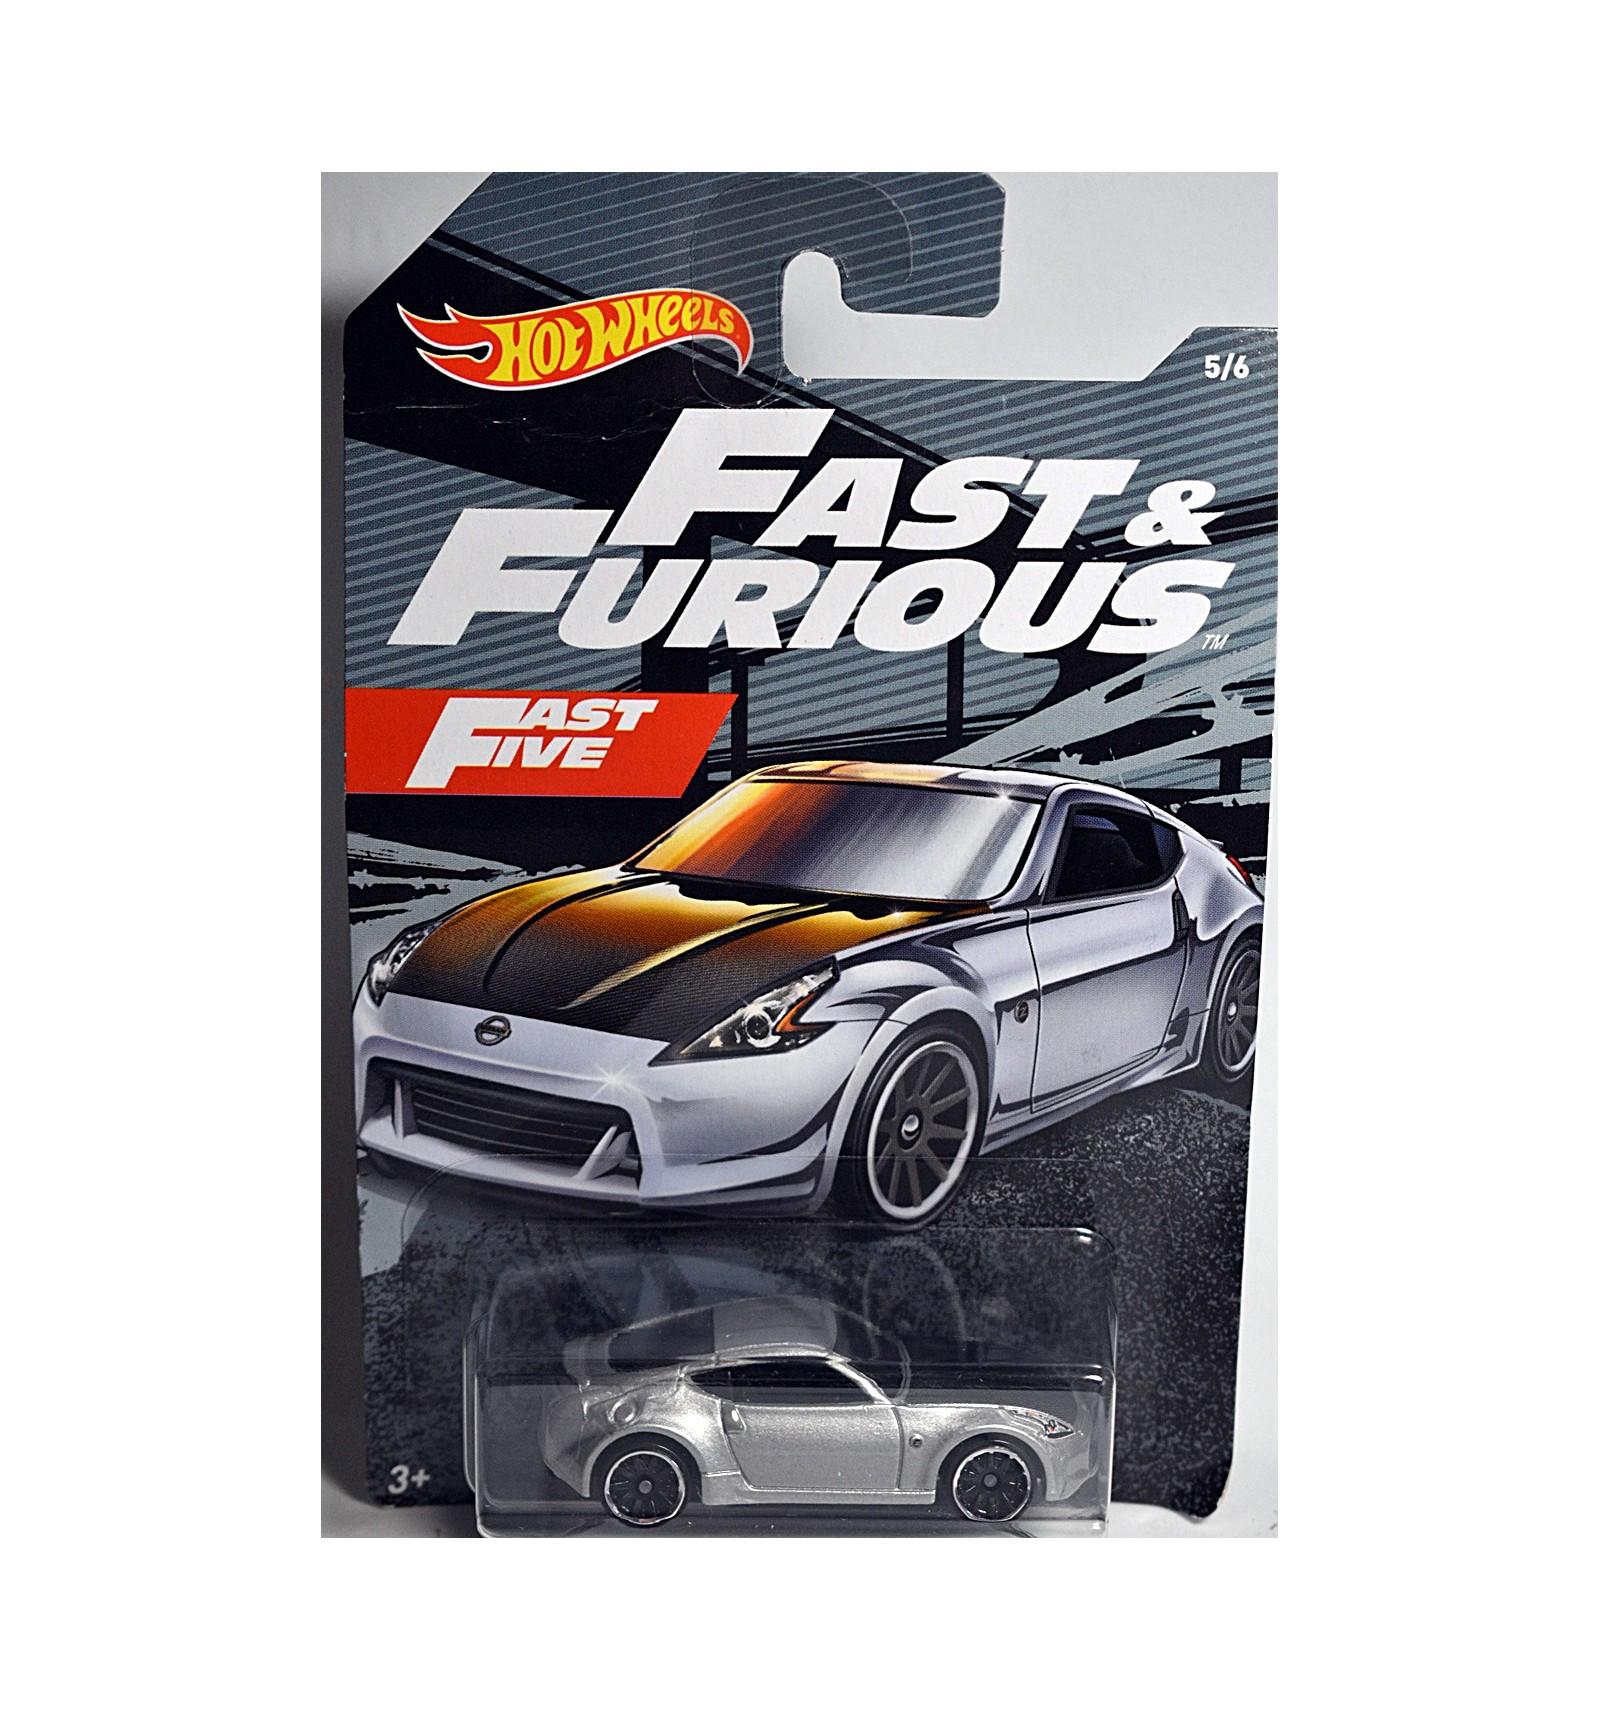 Hot Wheels Fast Furious Nissan Nissan 350z